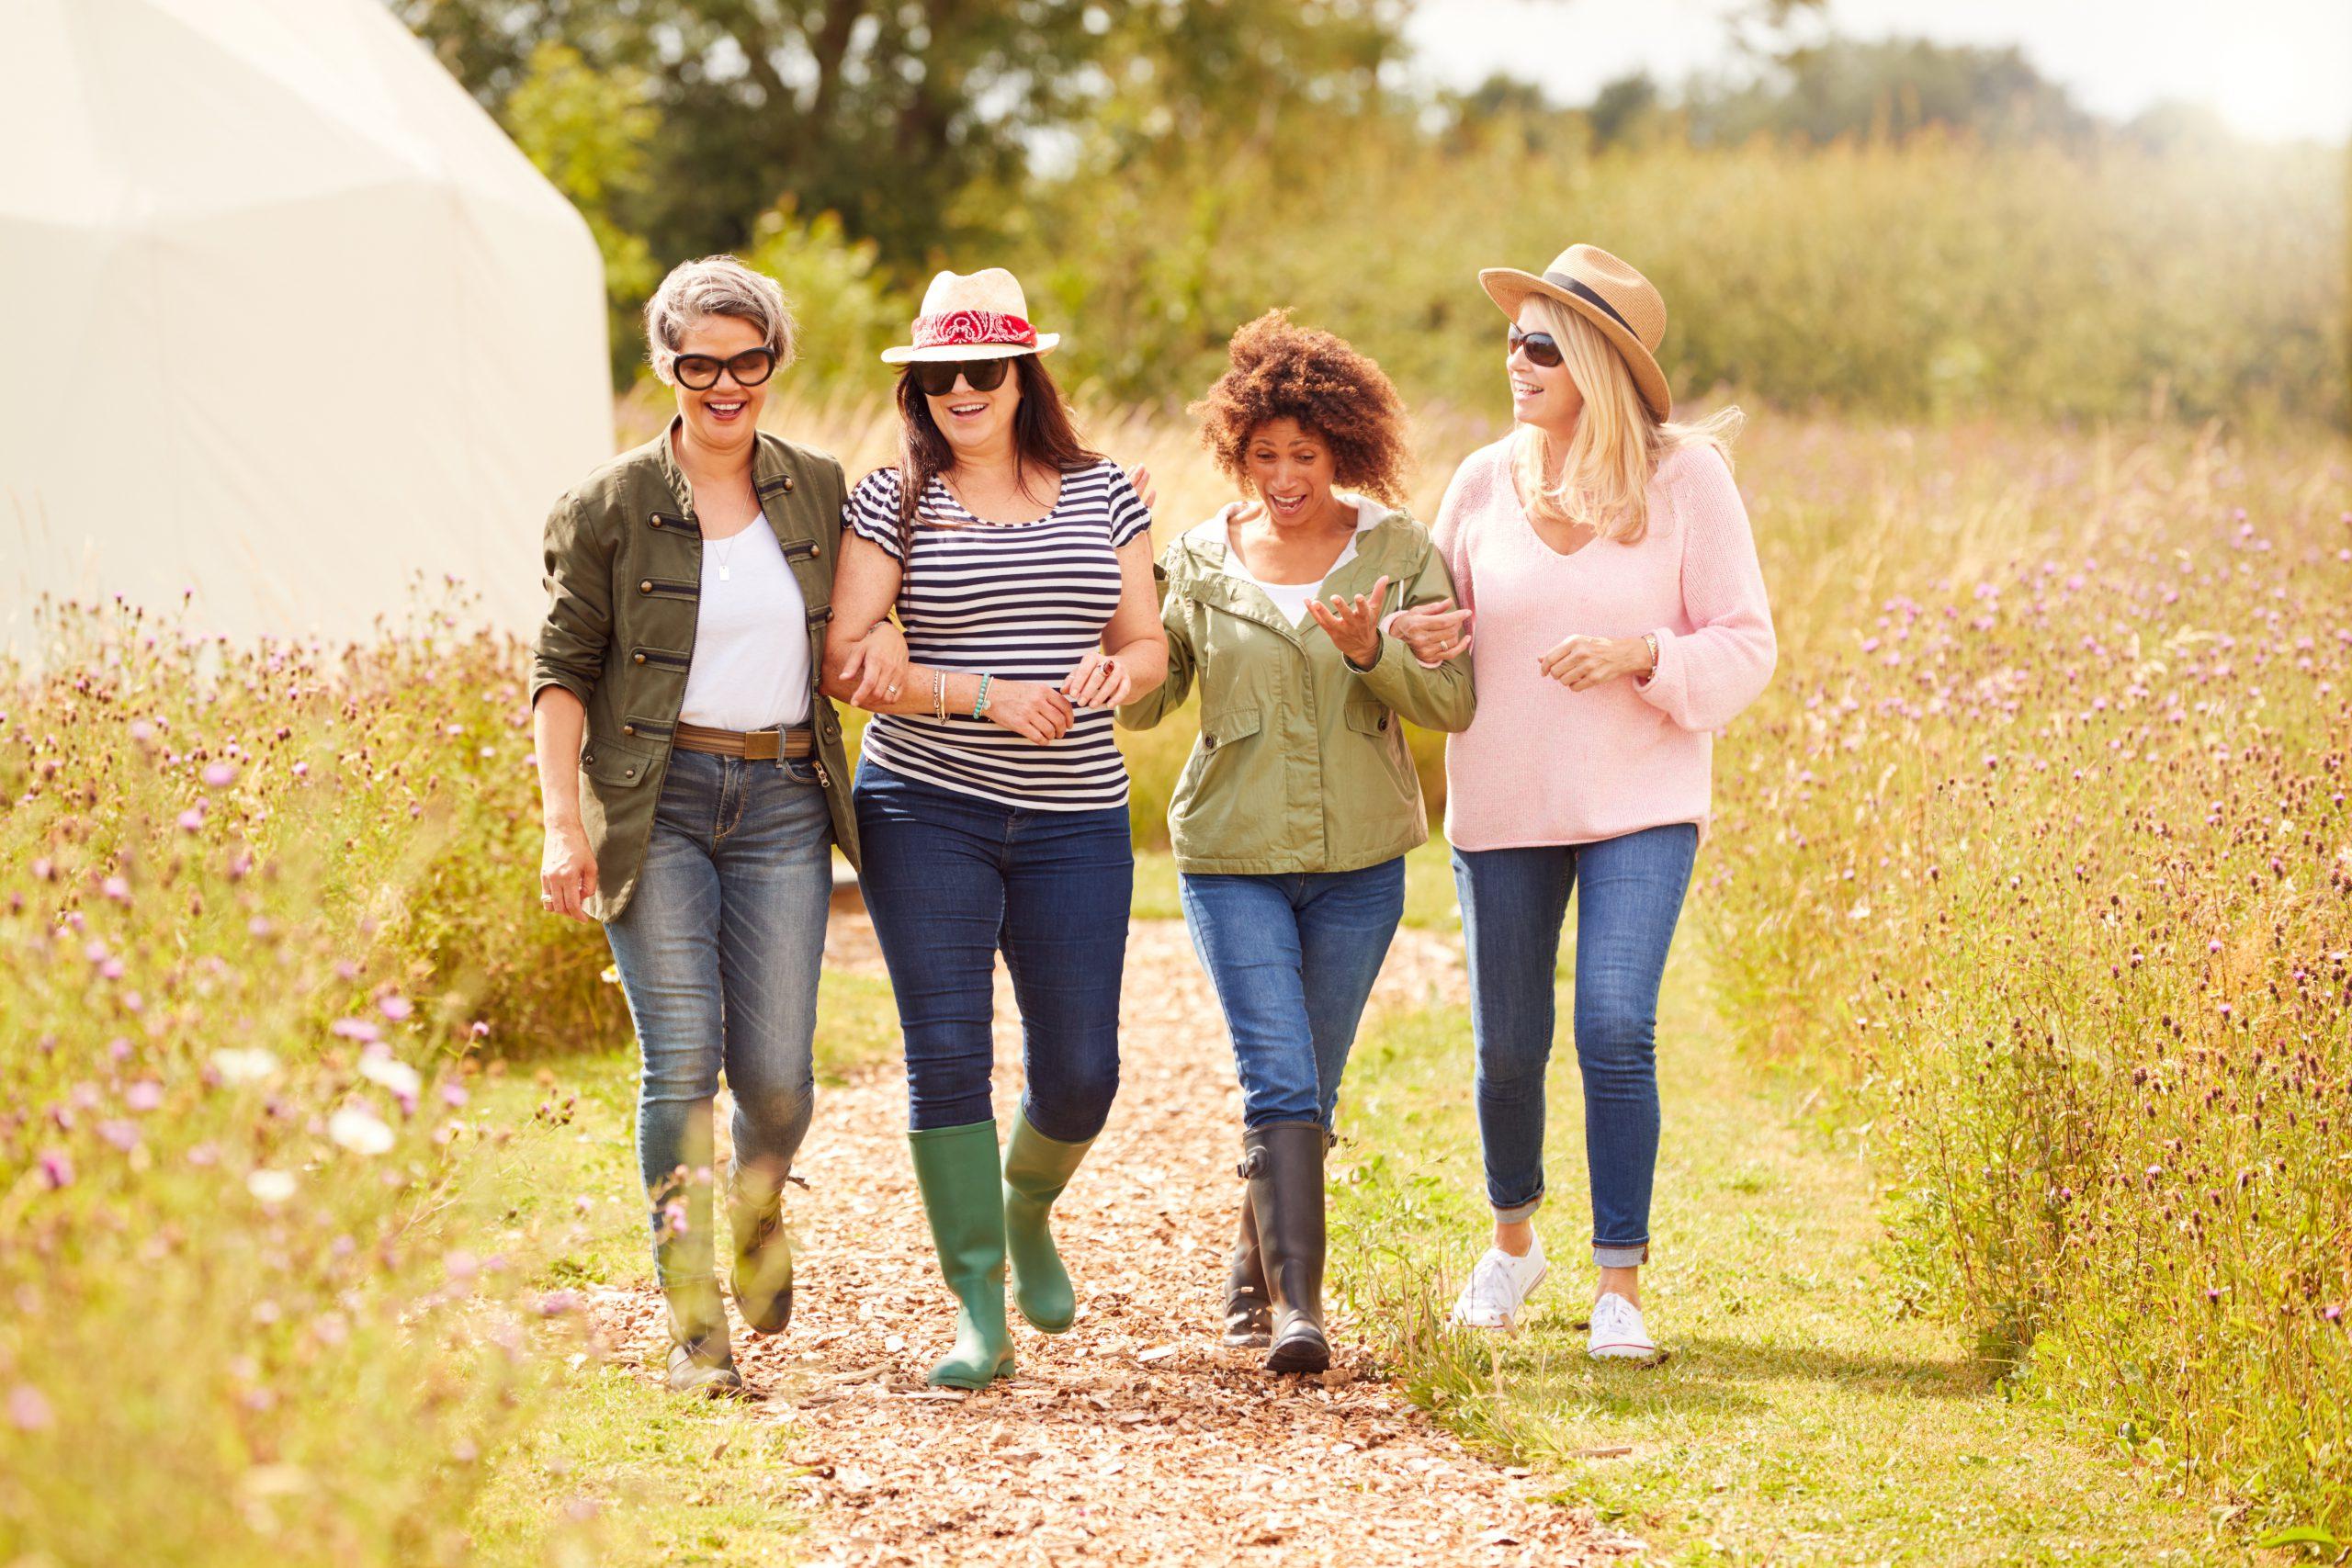 Womens retreat in nature